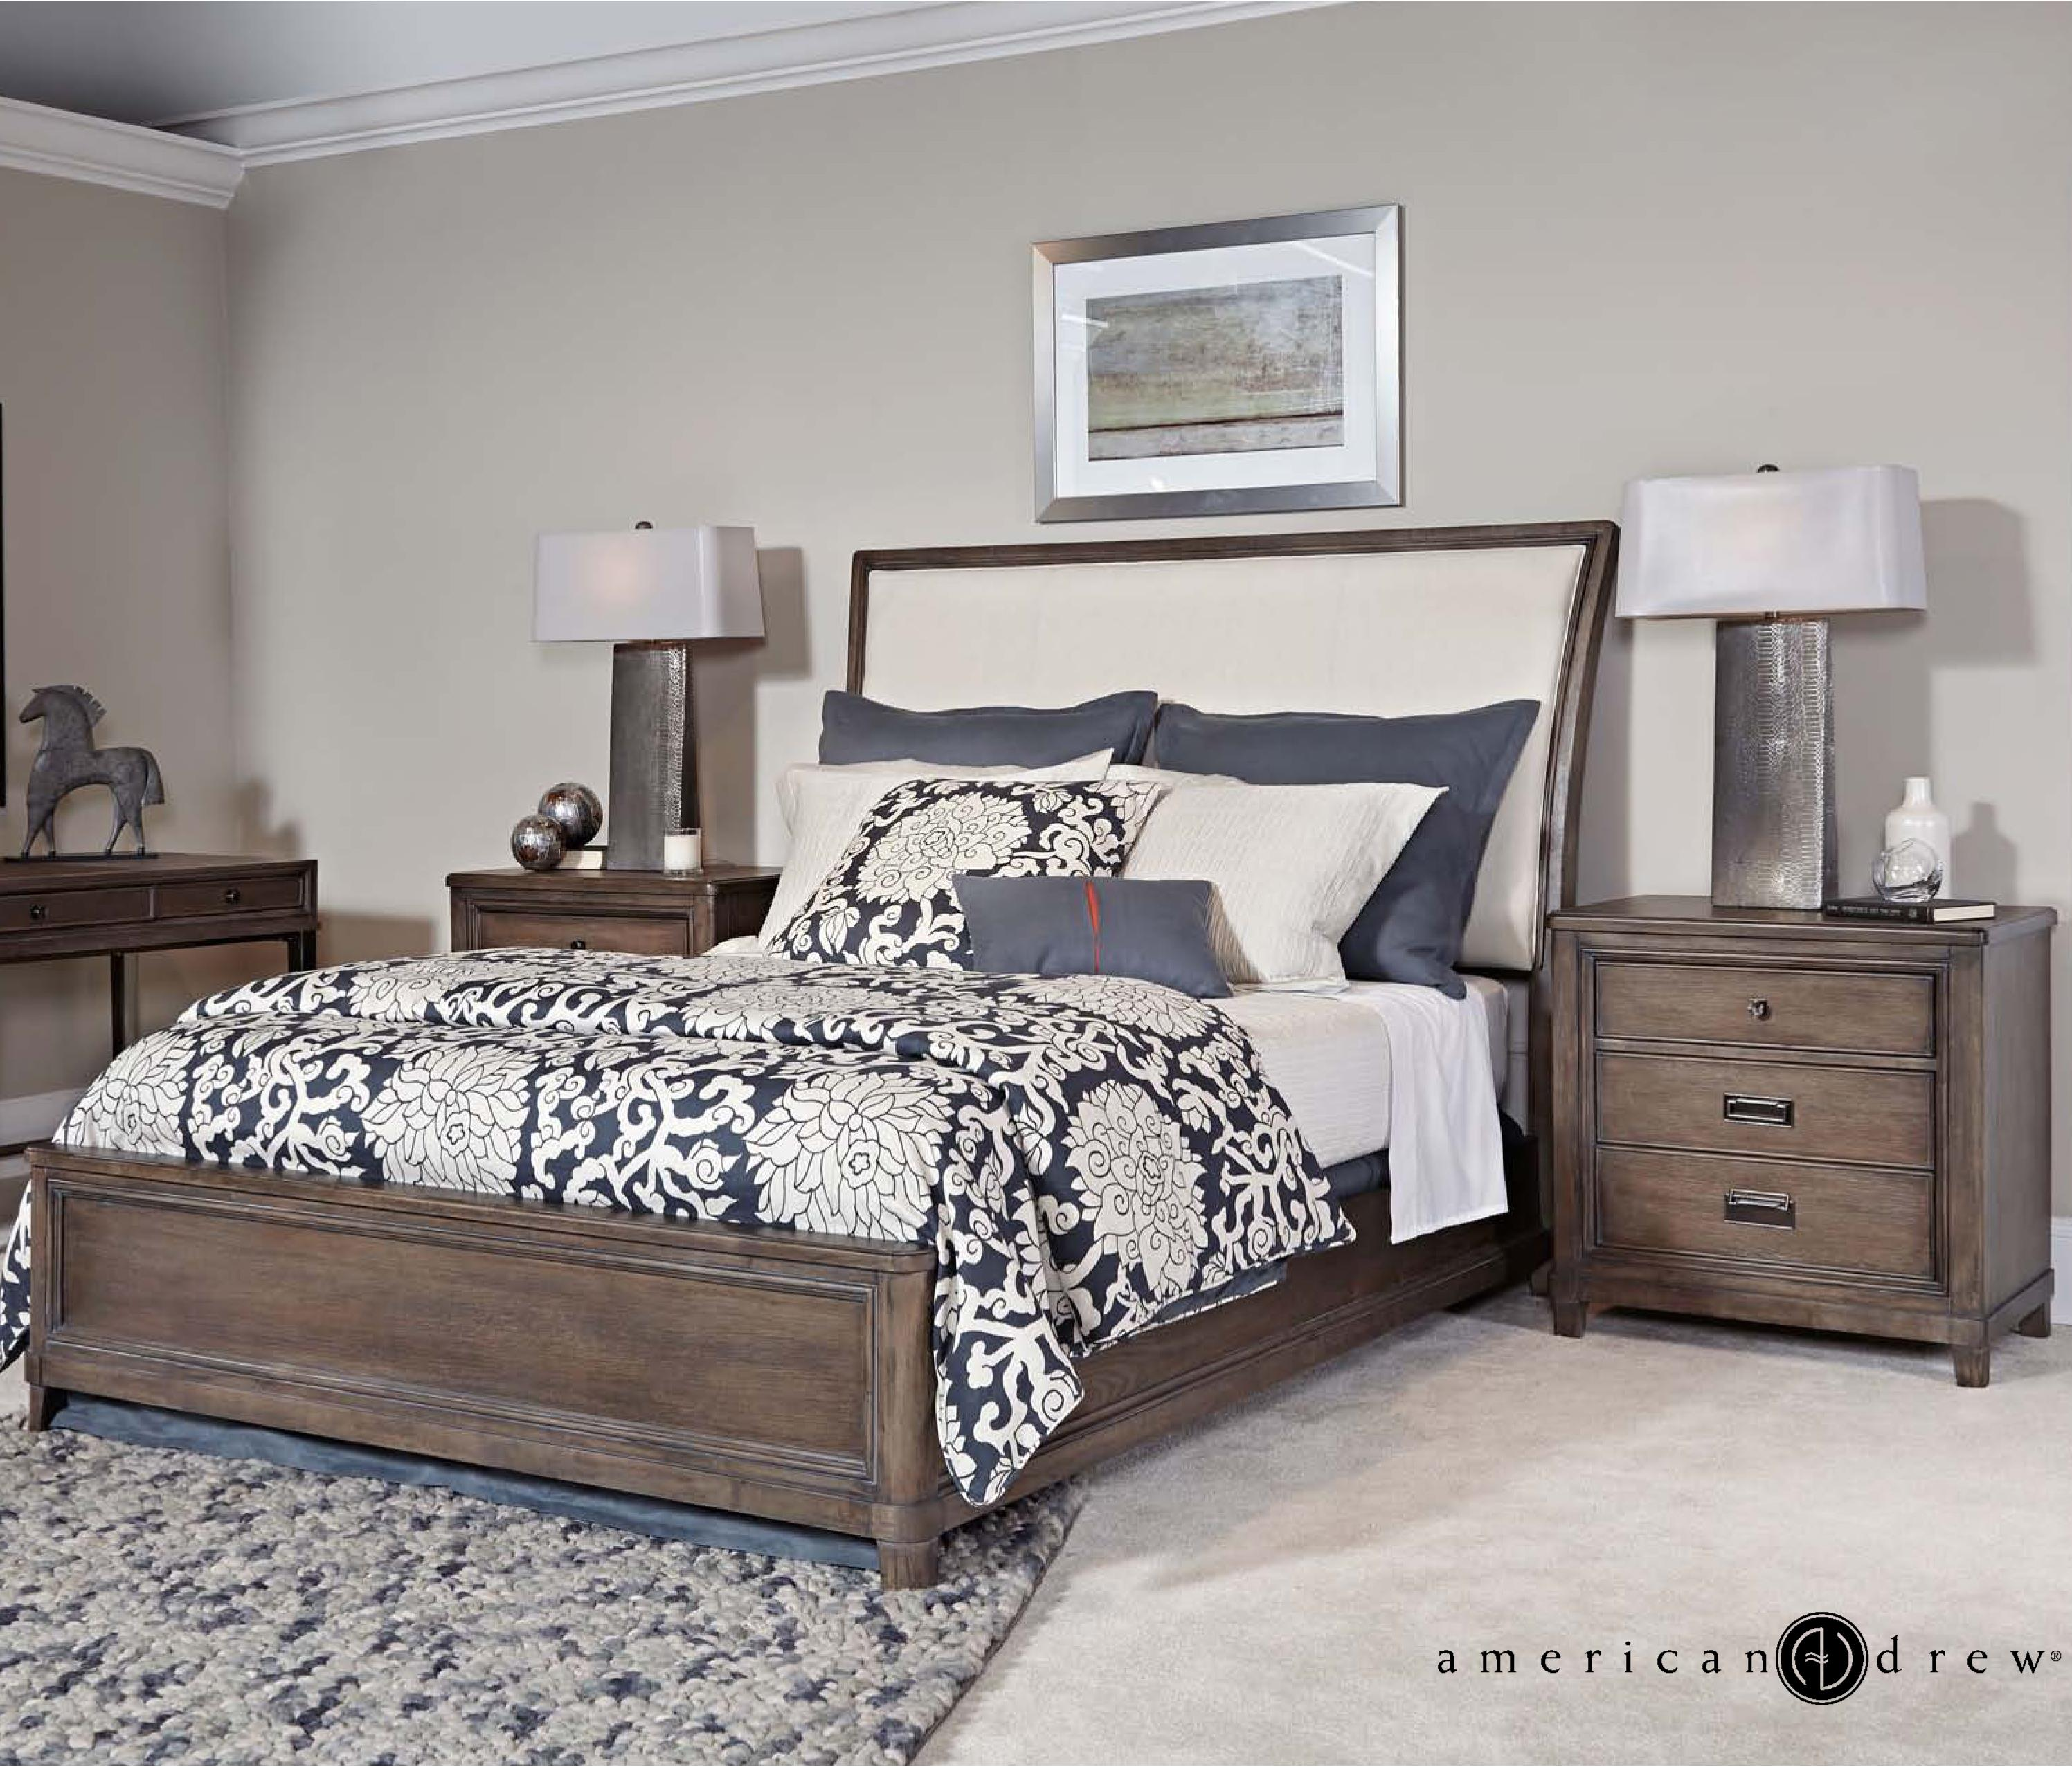 American Drew Park Studio California King Bedroom Group - Item Number: 488 CK Bedroom Group 1